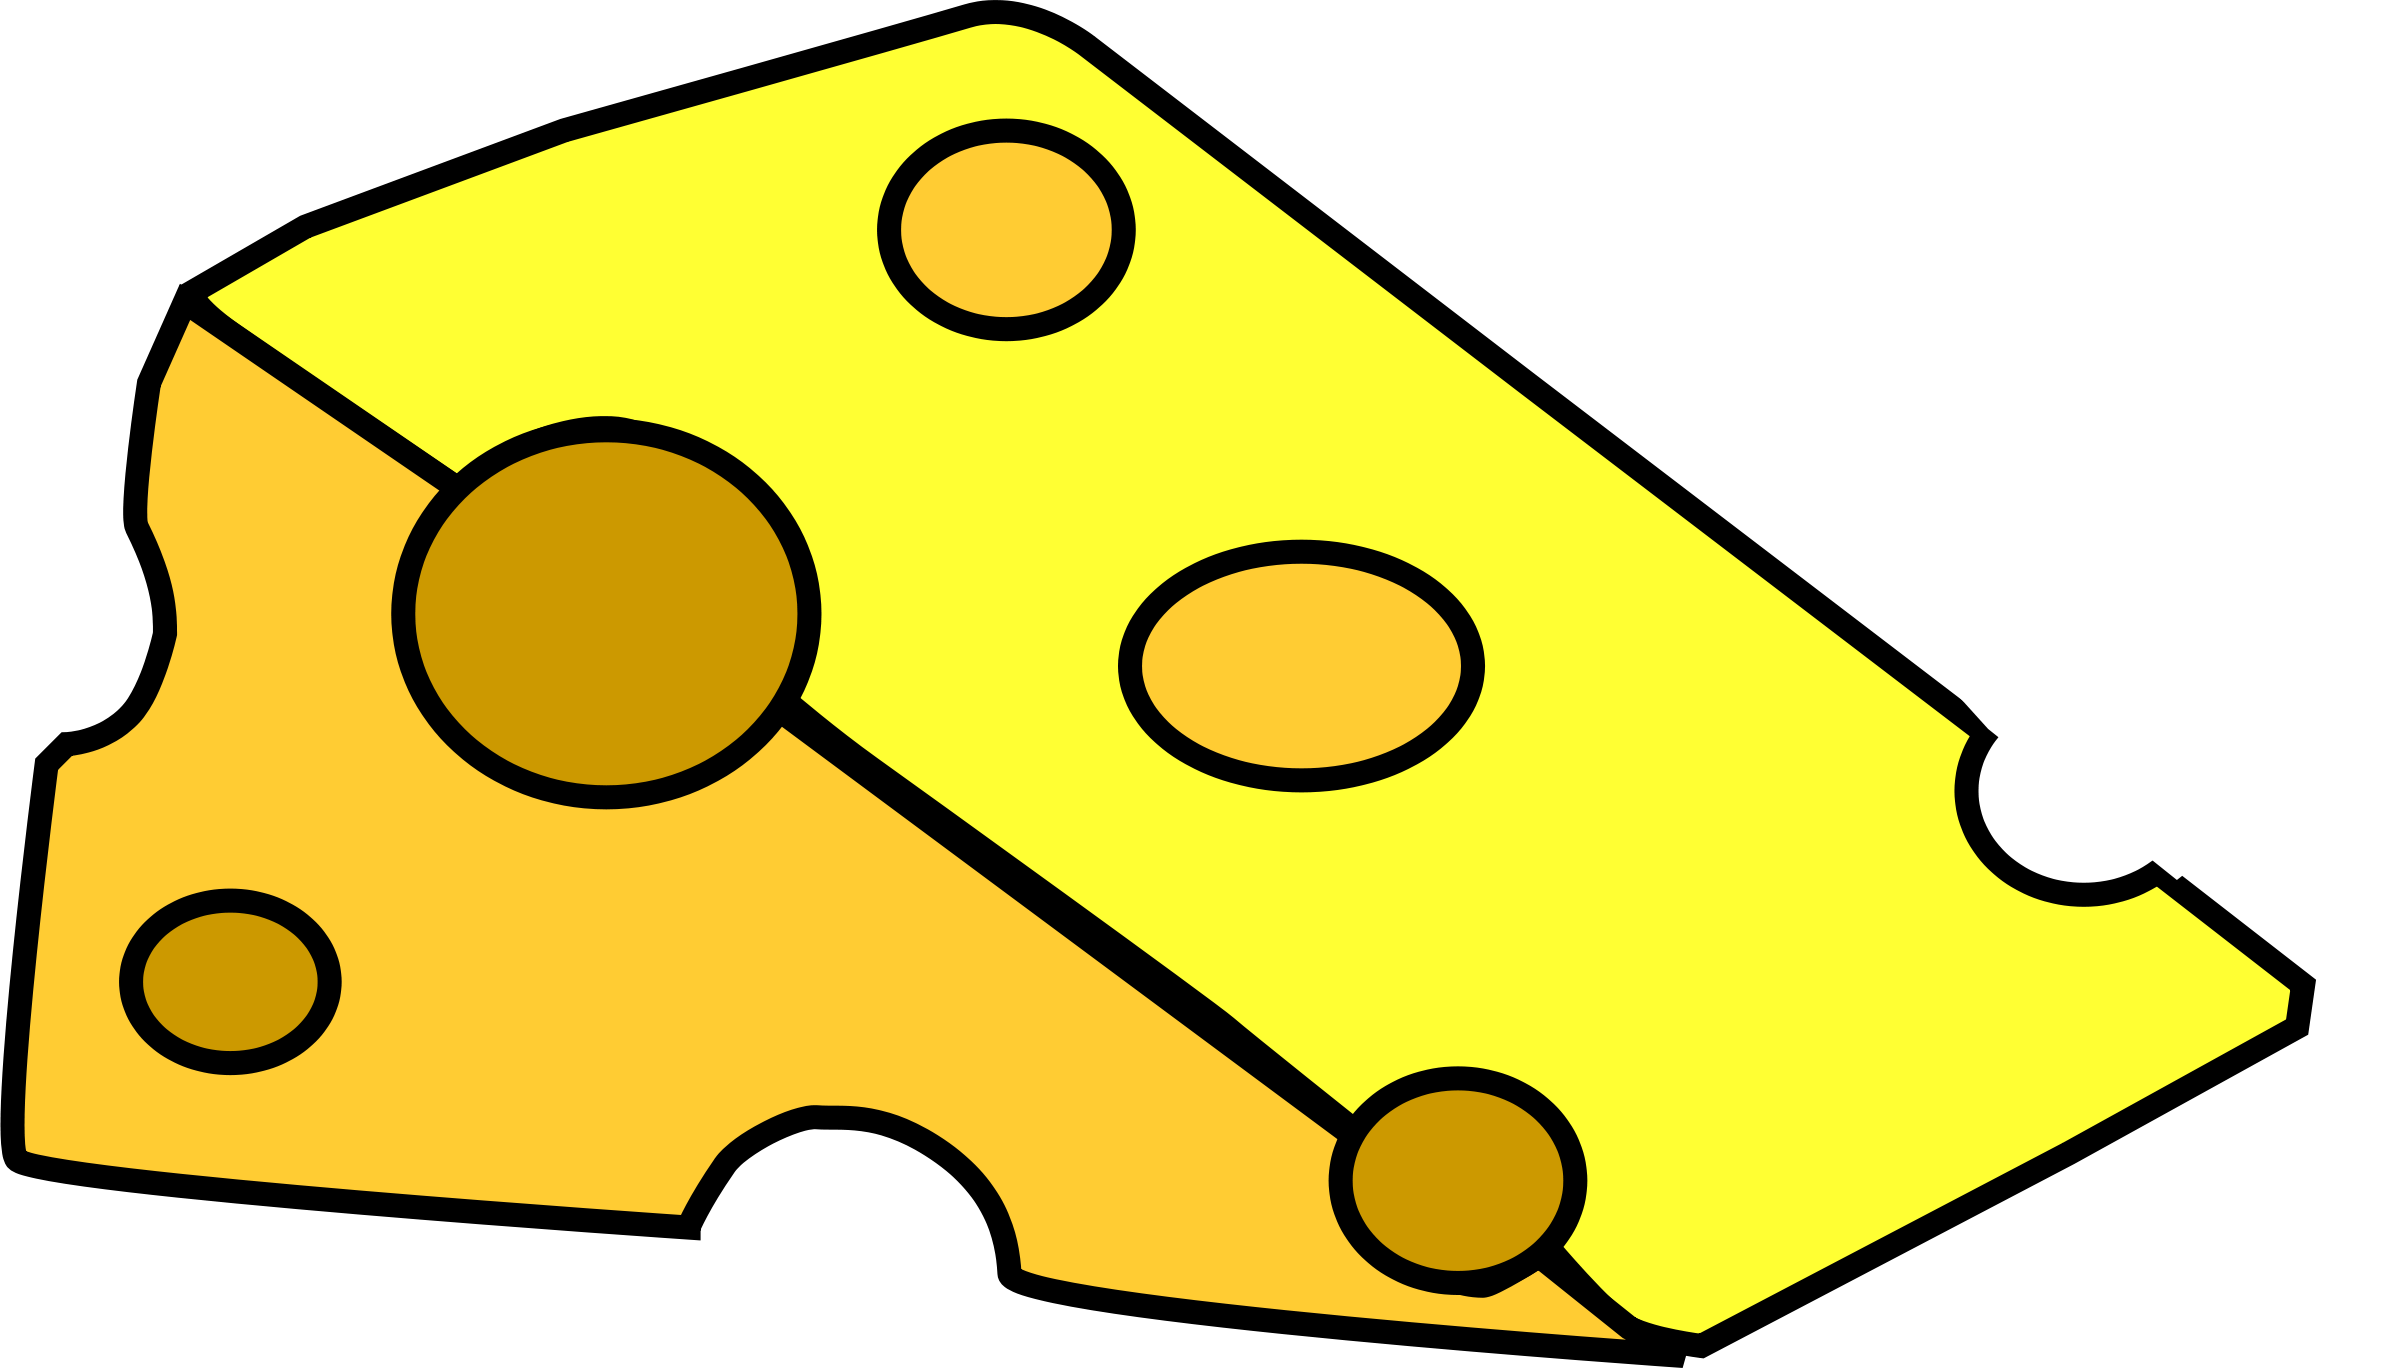 Cheese Fries Clipart - Clipart Kid